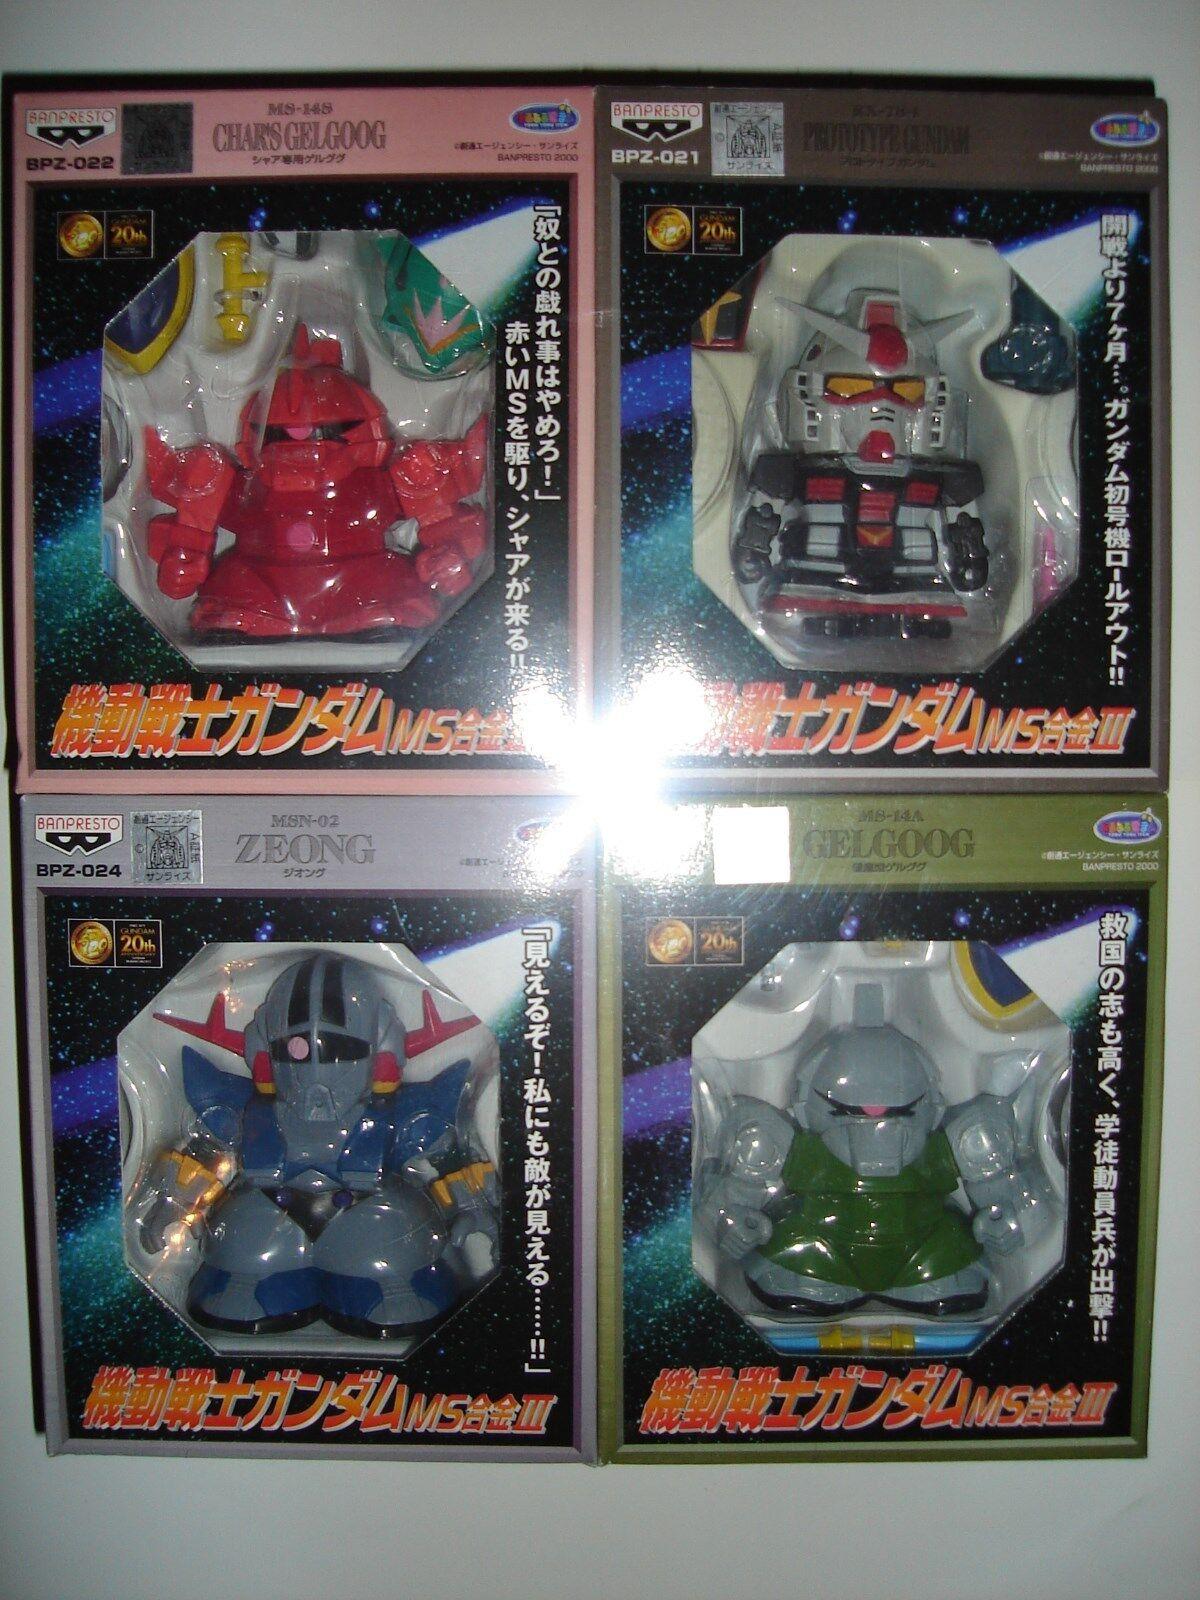 MS Gokin III diecast SD Gundam 4 figure set - Predotype, Char's Gelgoog, Zeong